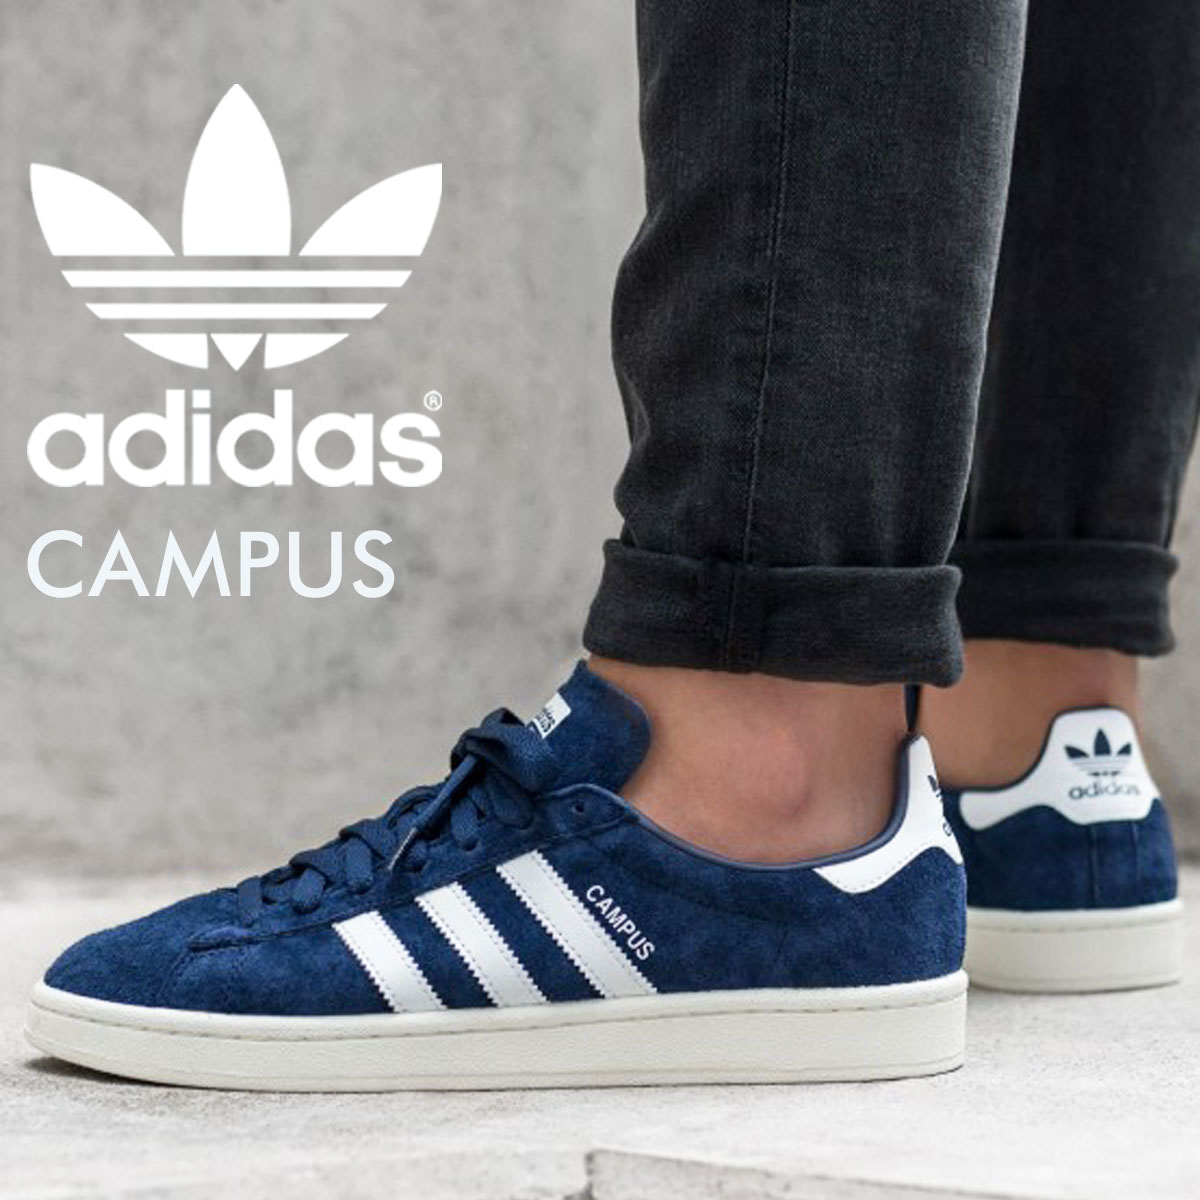 ADIDAS ORIGINALS Sneakers For Men